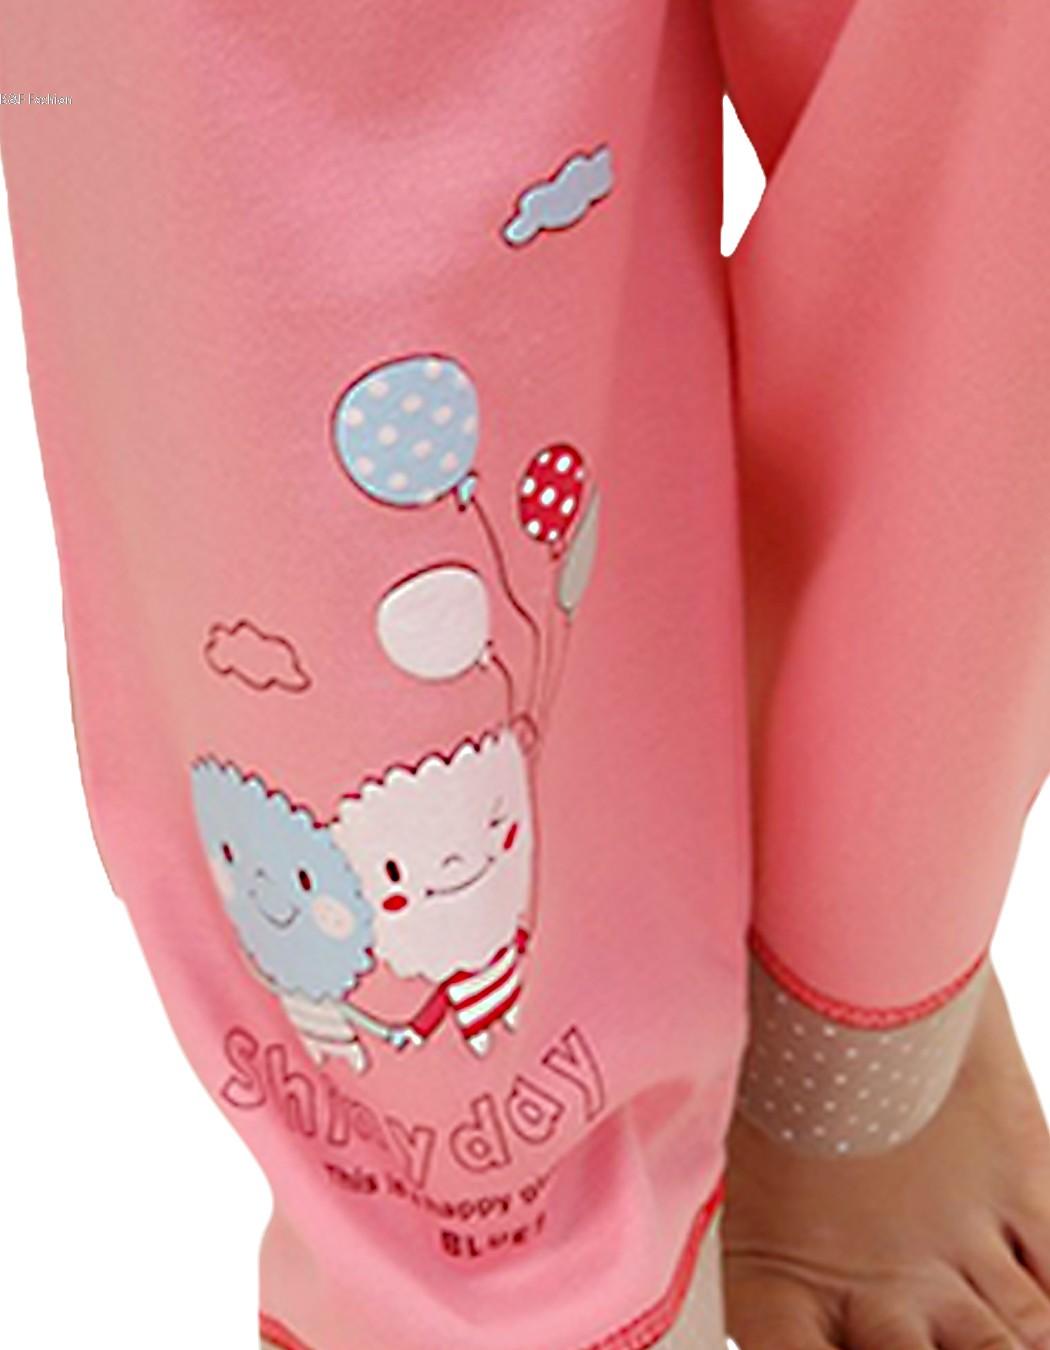 Ladies Women s Cute Cartoon Balloon Pattern Long Sleeve Cotton Pajamas  Sleepwear Sleep Clothes-in Pajama Sets from Underwear   Sleepwears on  Aliexpress.com ... 011d1e845